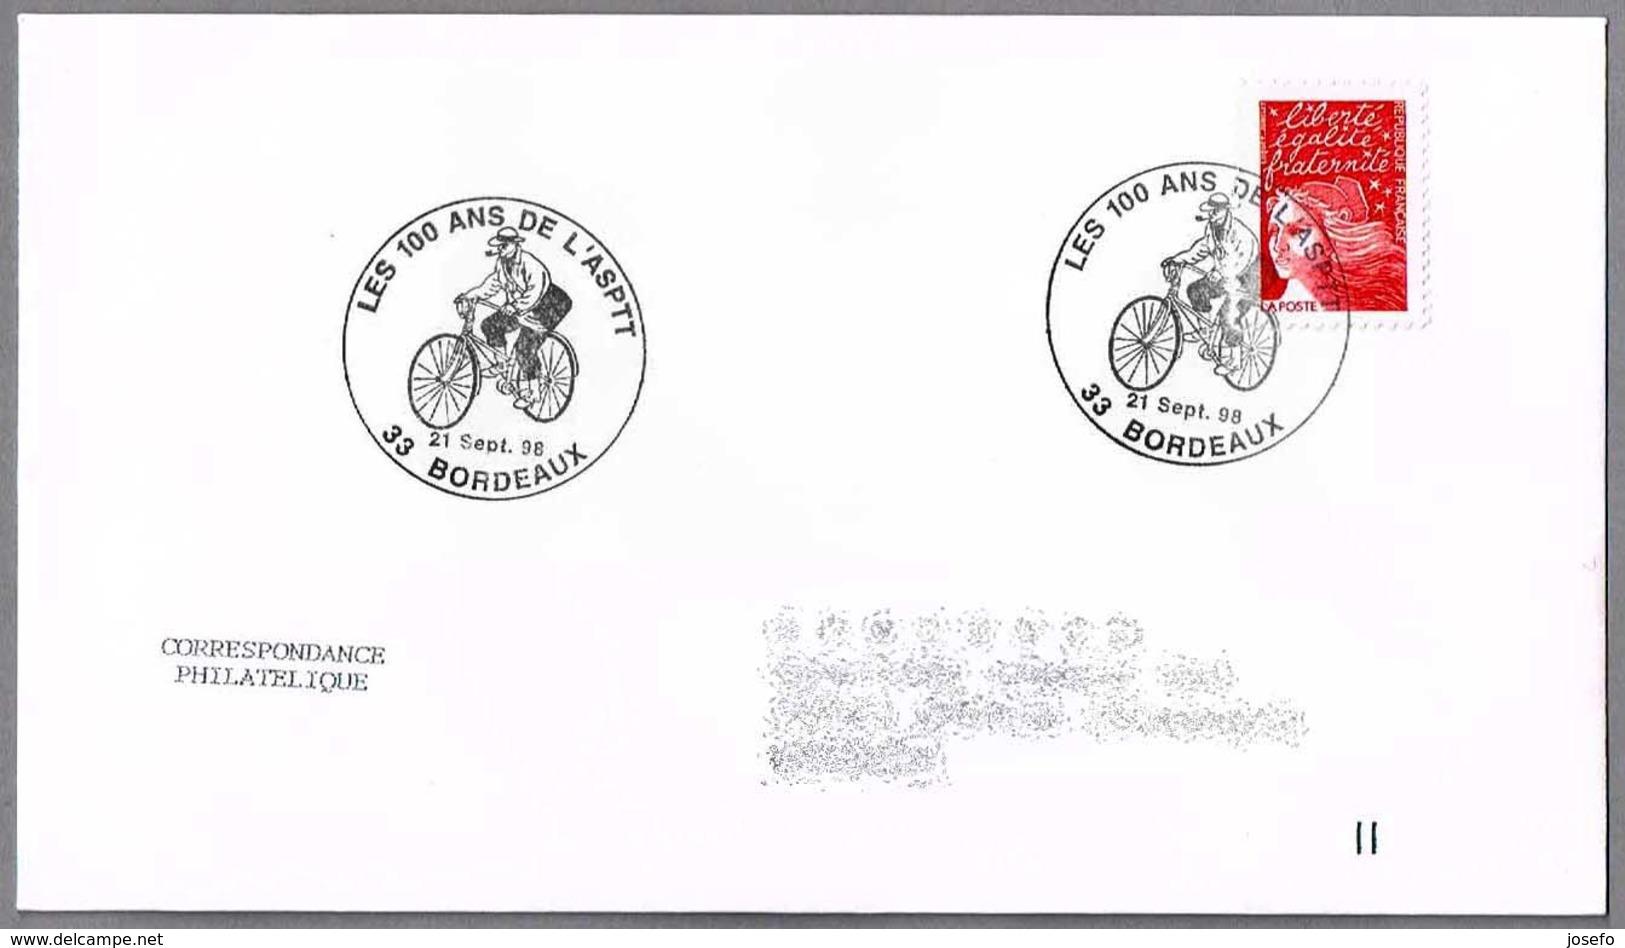 100 Años ASPTT (Assoc.Sportive Postes Et Telegraphes) - CARTERO - POSTMAN. Bordeaux 1998 - Correo Postal